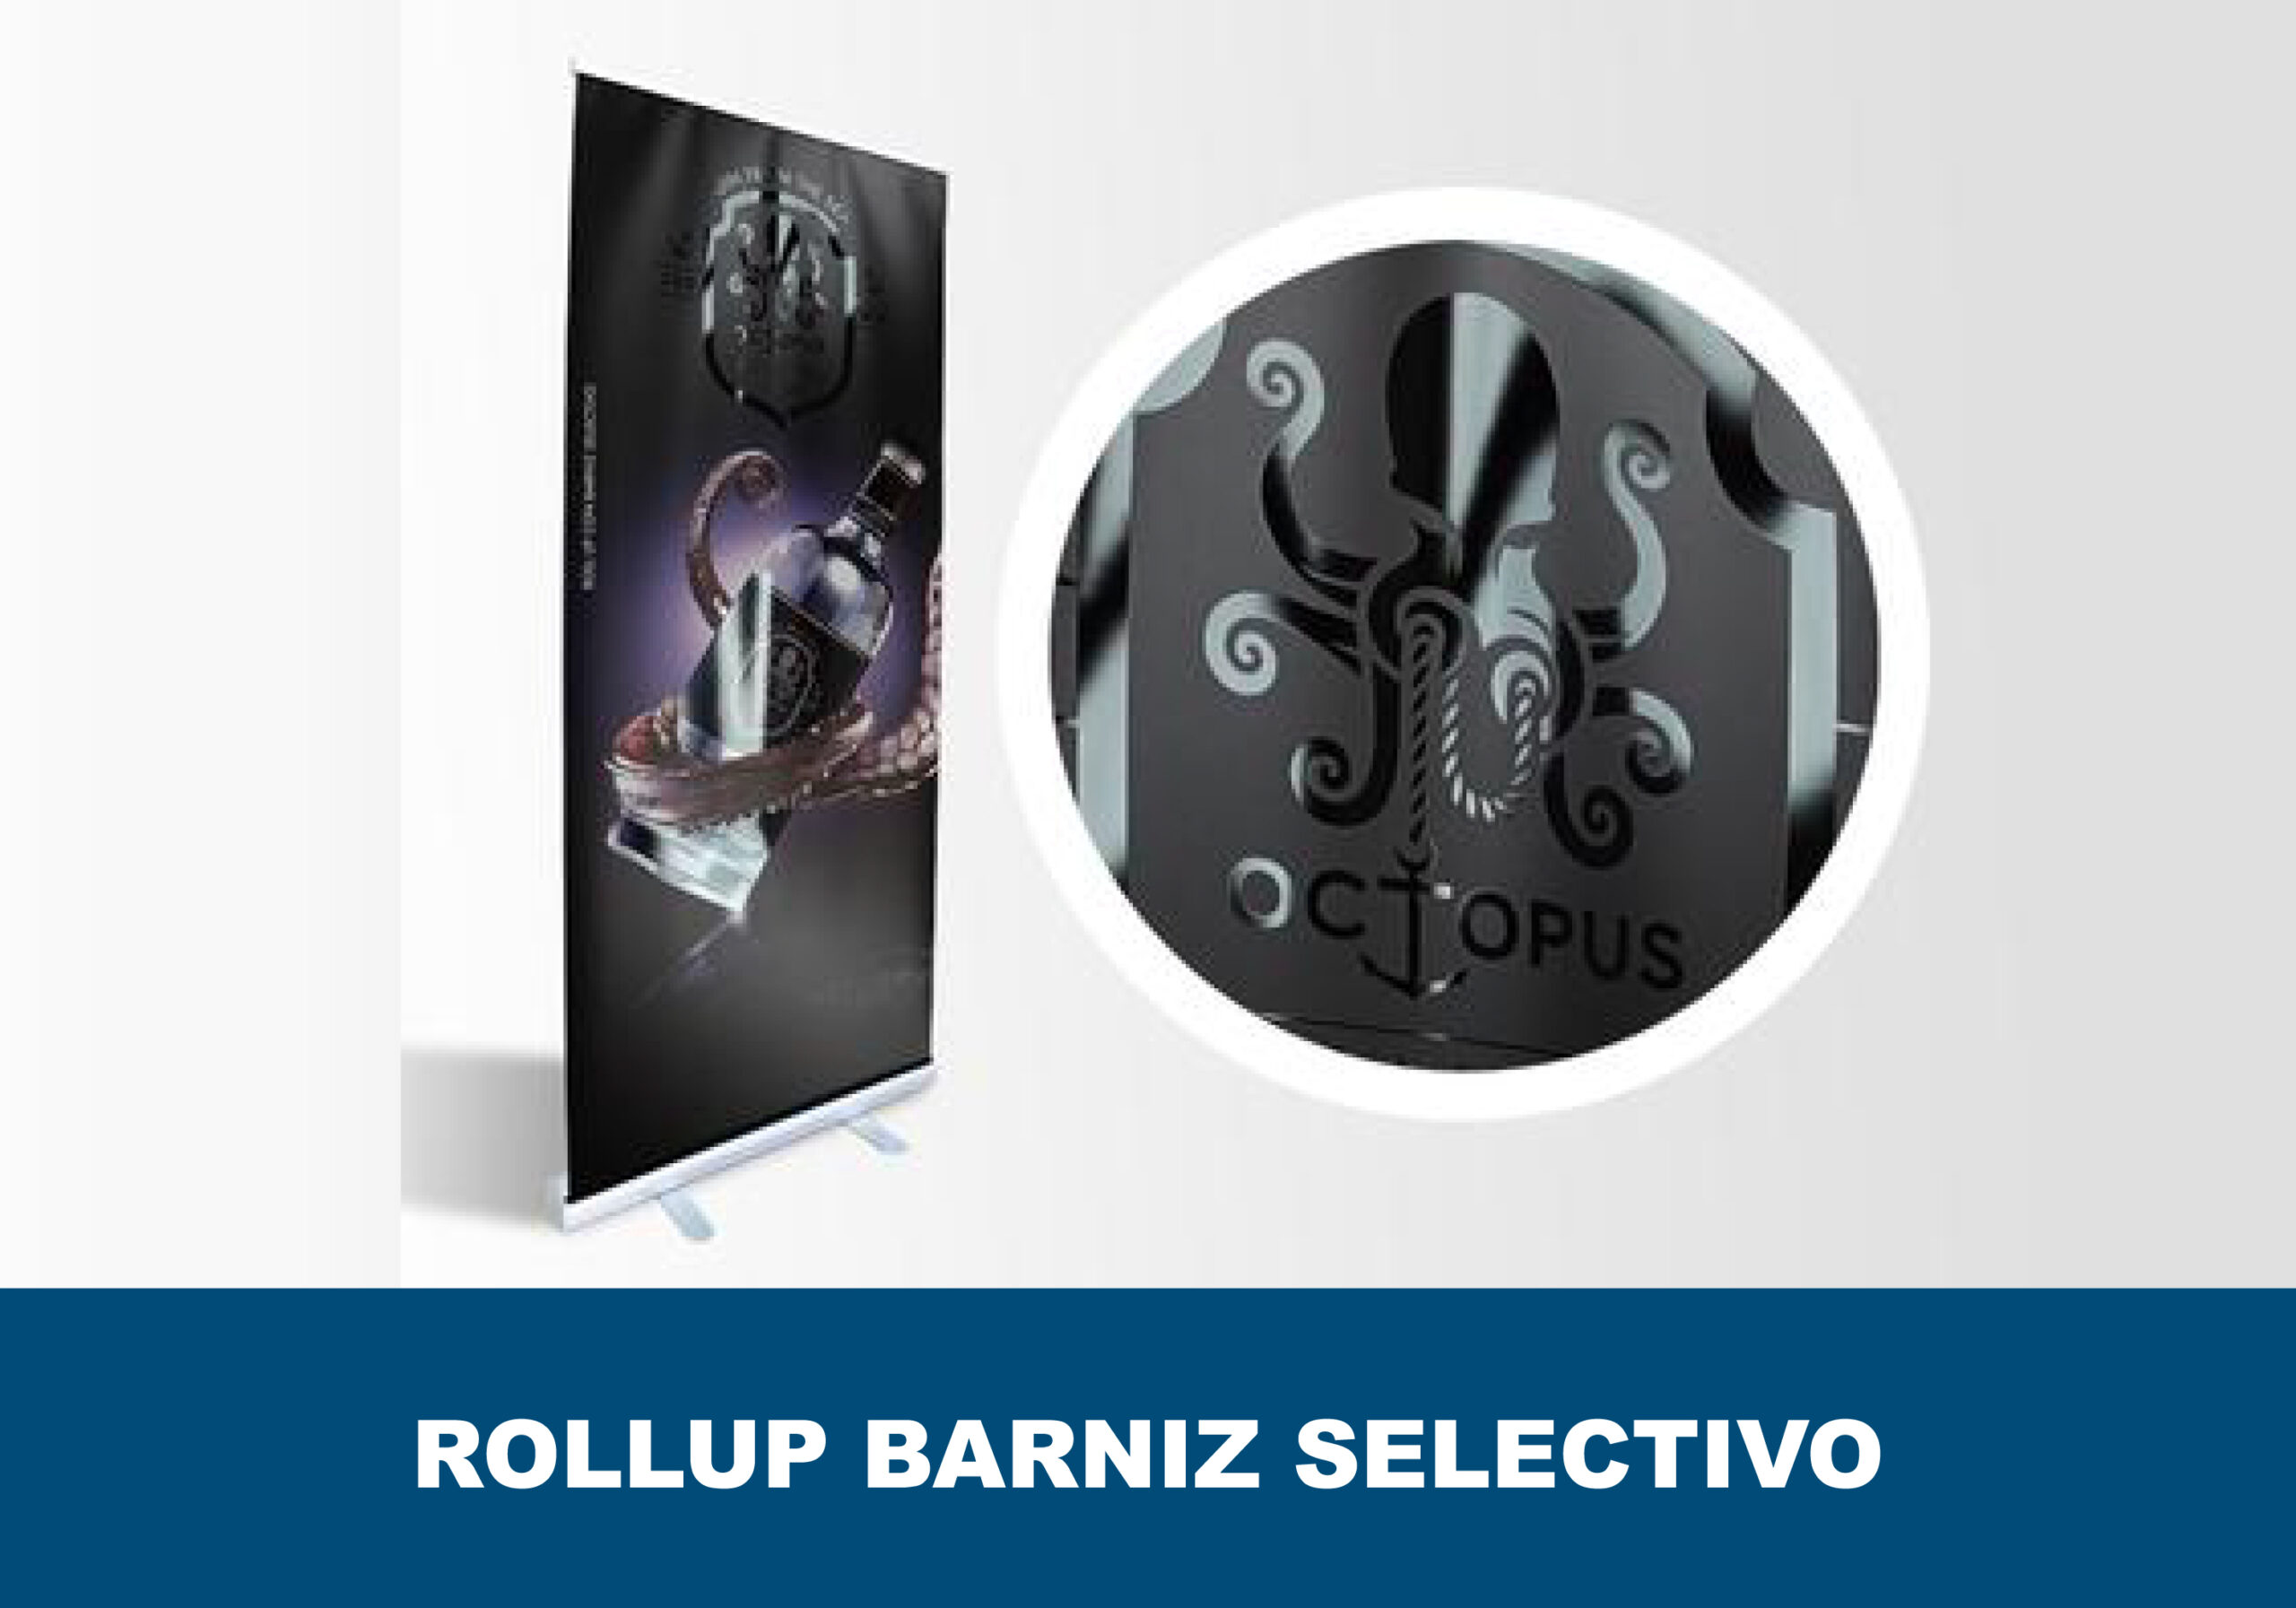 Roll up barniz selectivo